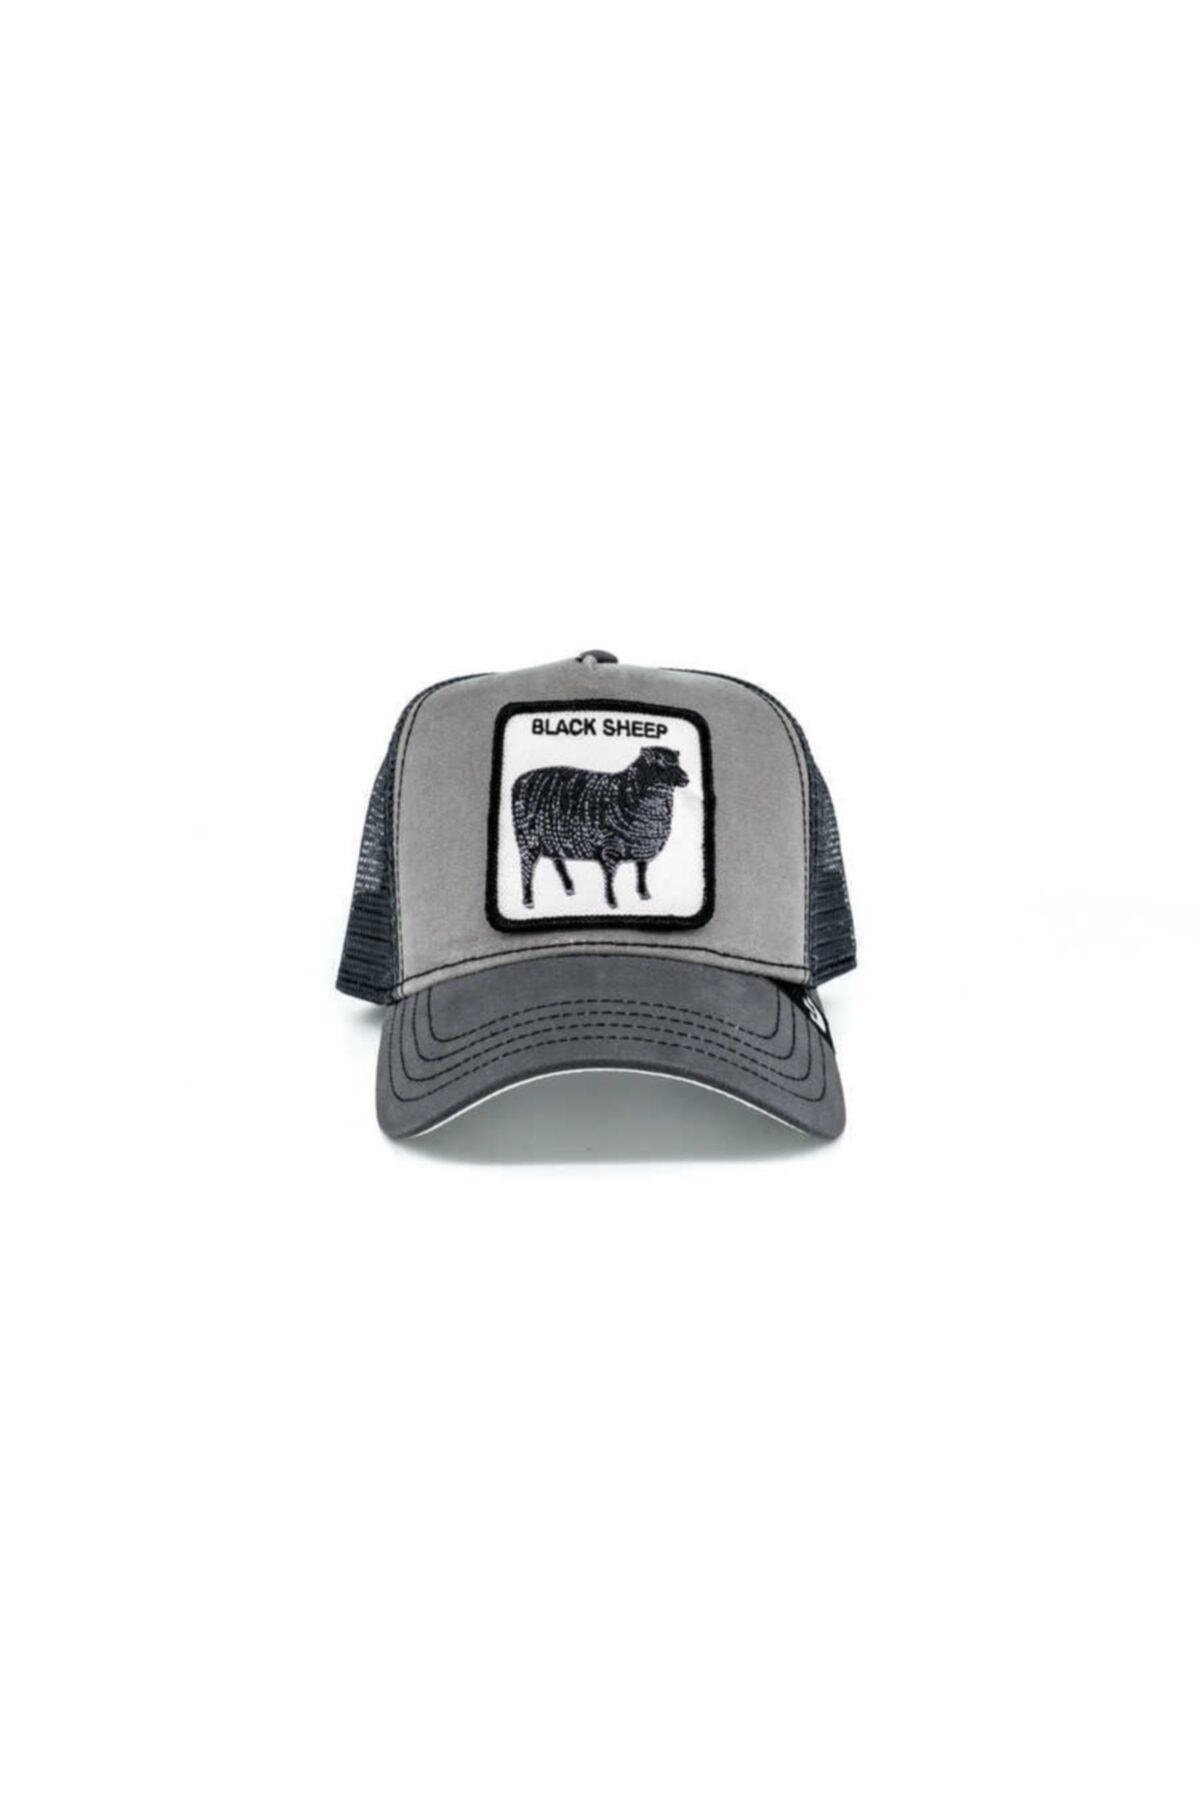 Goorin Bros Unisex Shades Of Black Gri Standart Şapka 601-9405 1